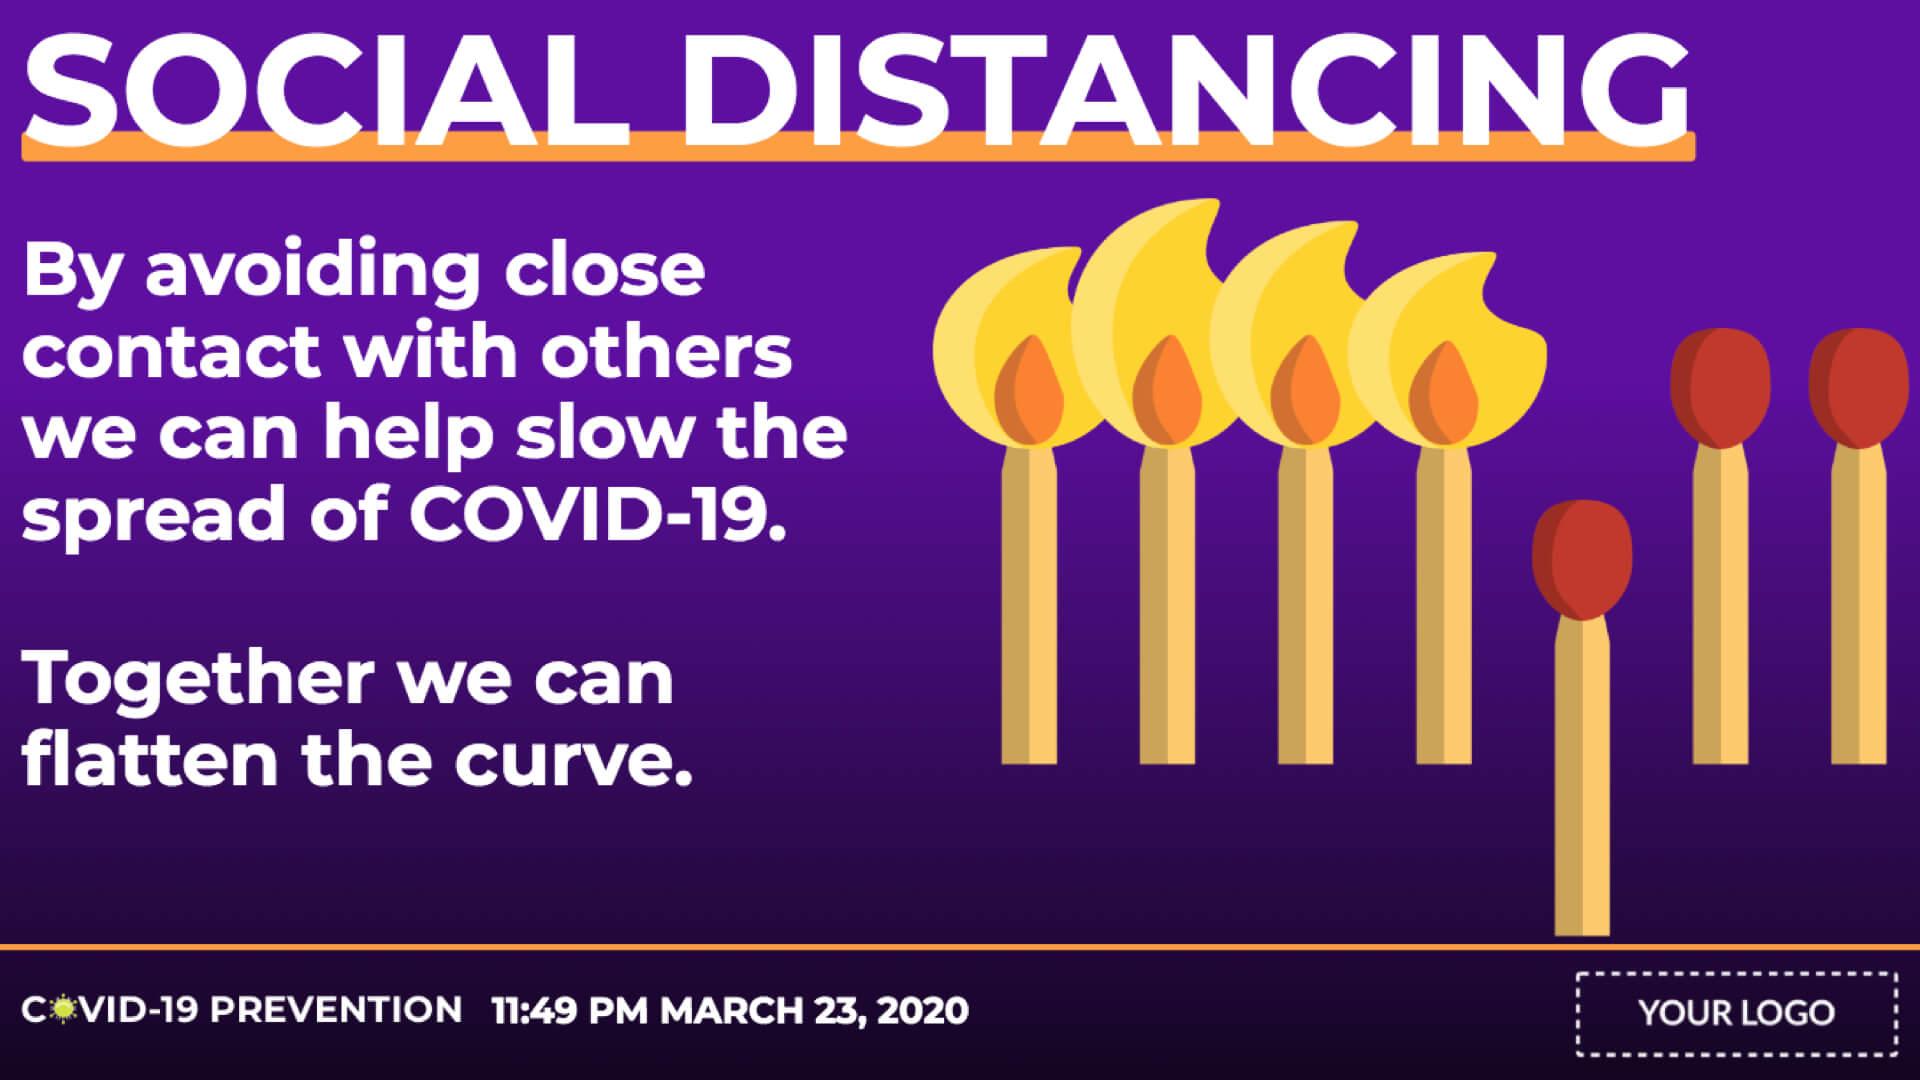 COVID-19 Social Distancing Digital Signage Template